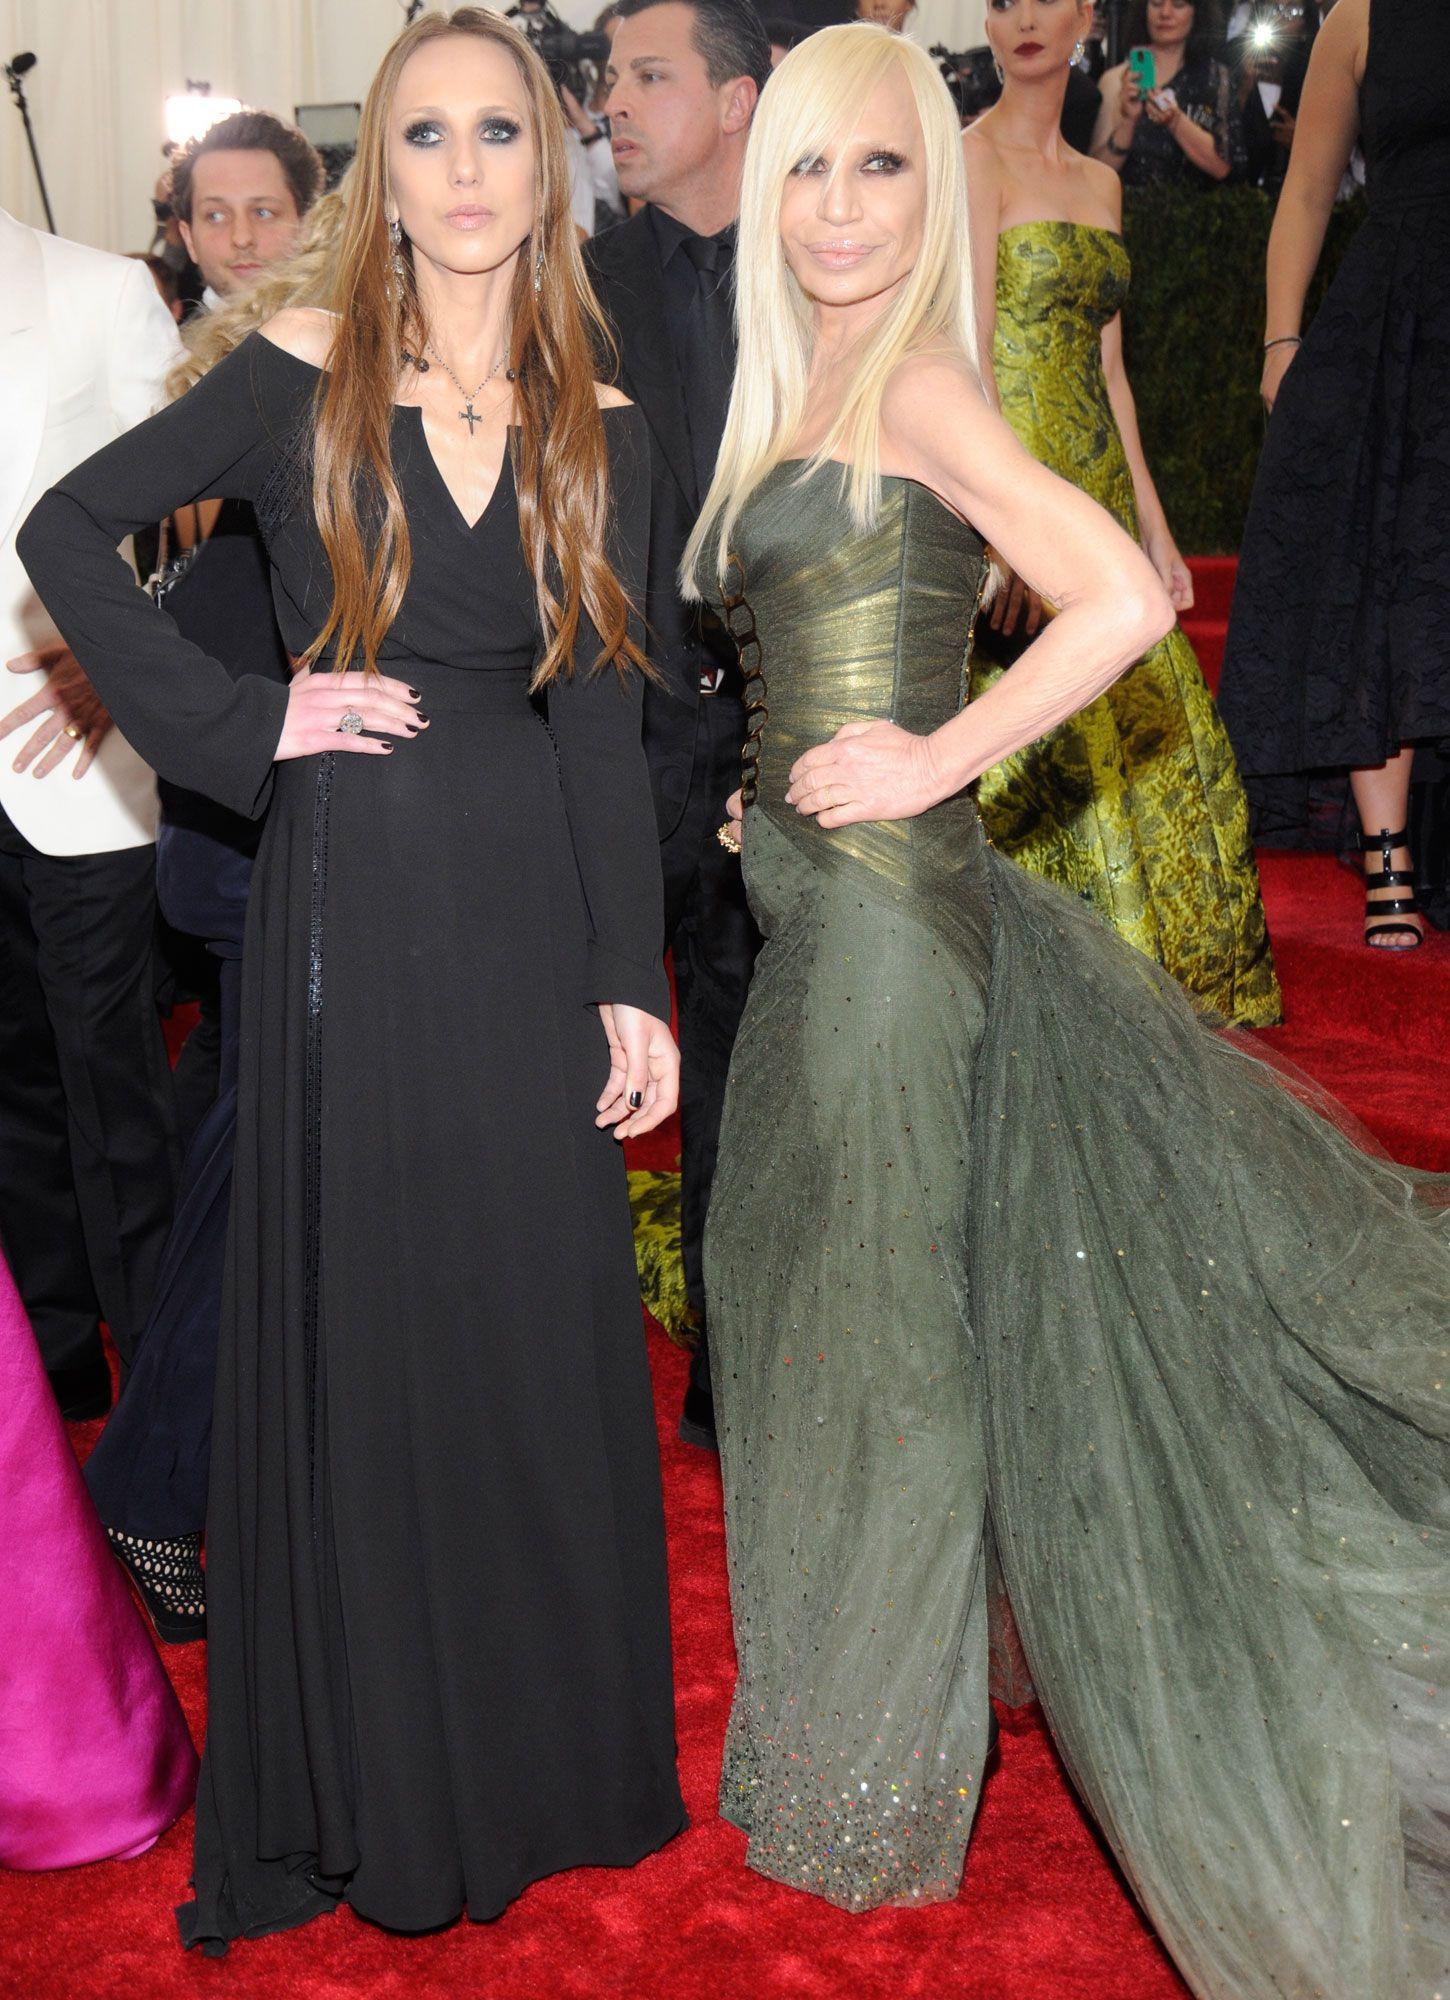 Having A Ball Gianni Donatella Versace Met Gala 2014 Fashion